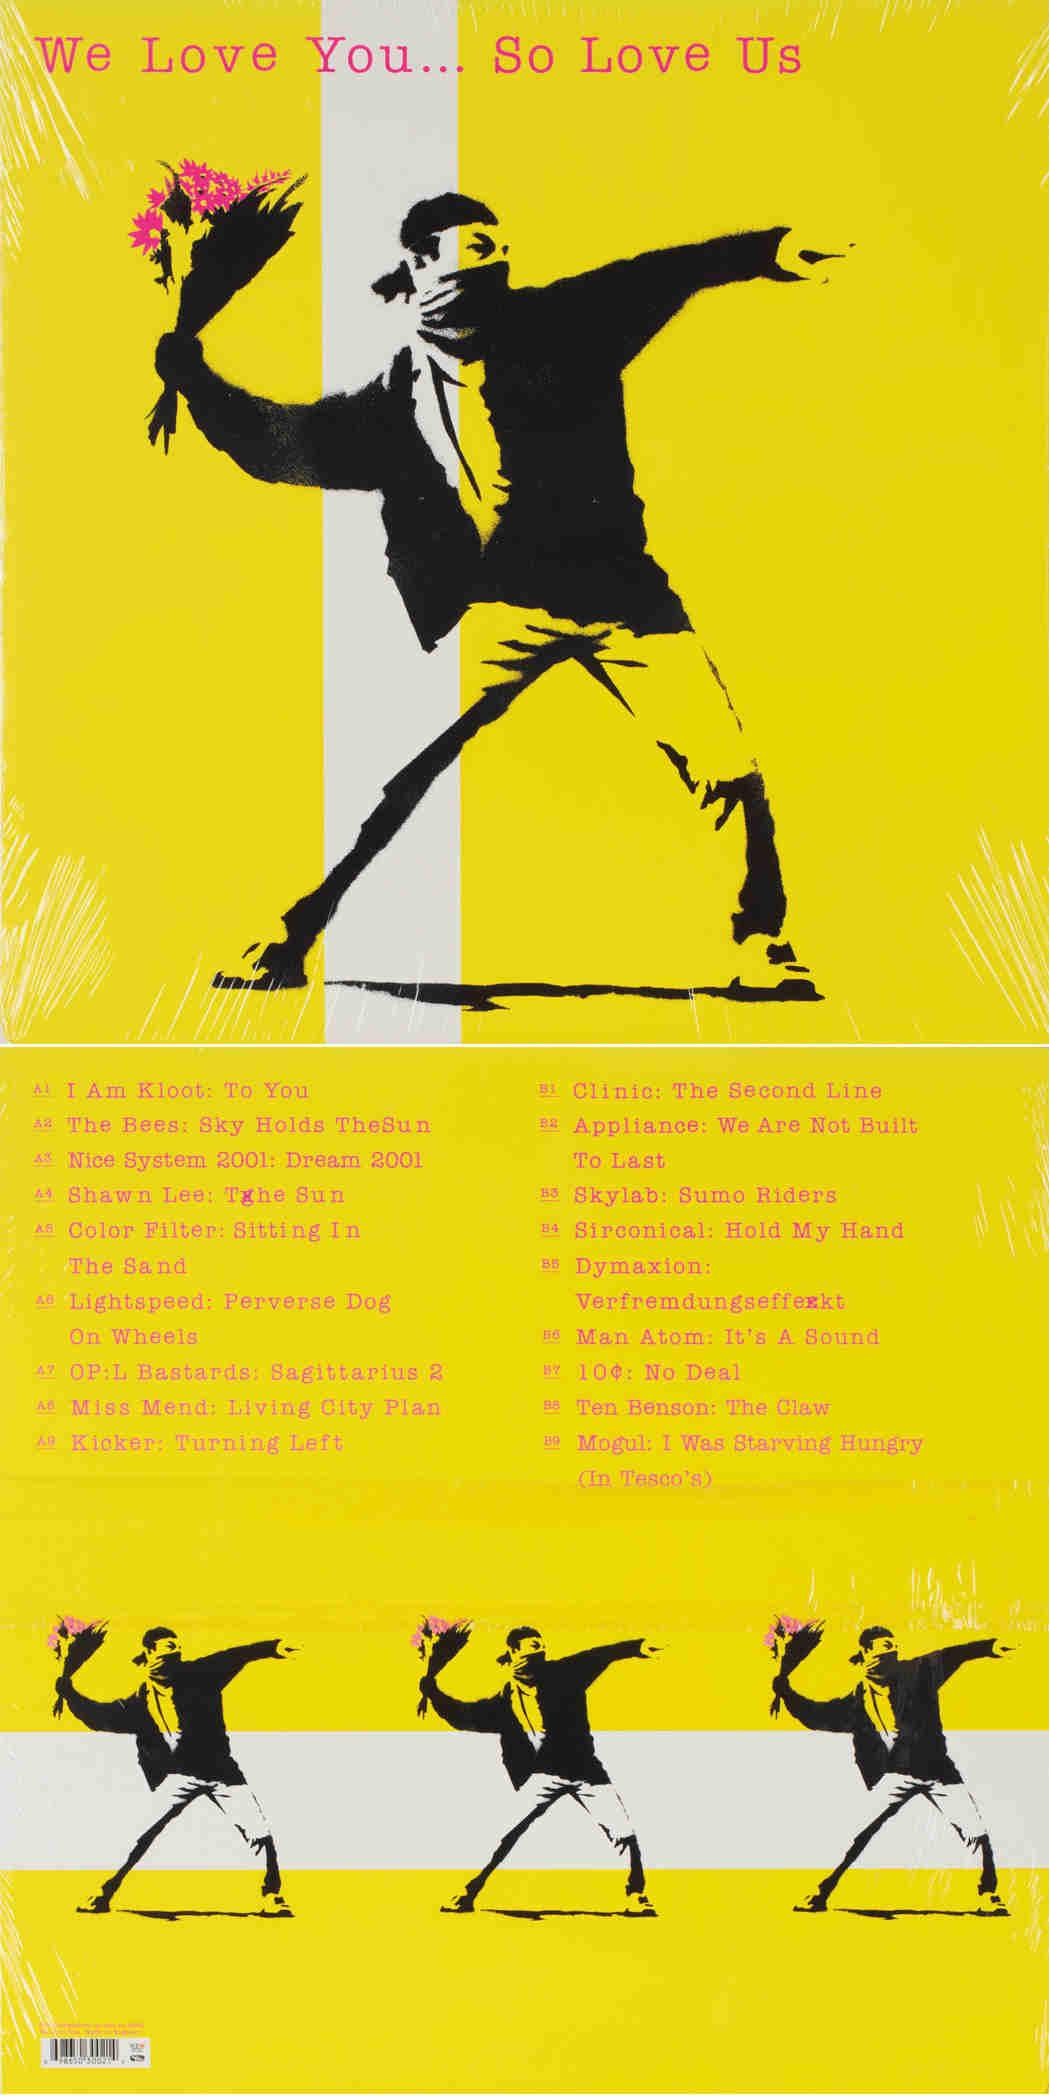 Banksy-We Love You... So Love Us-2000